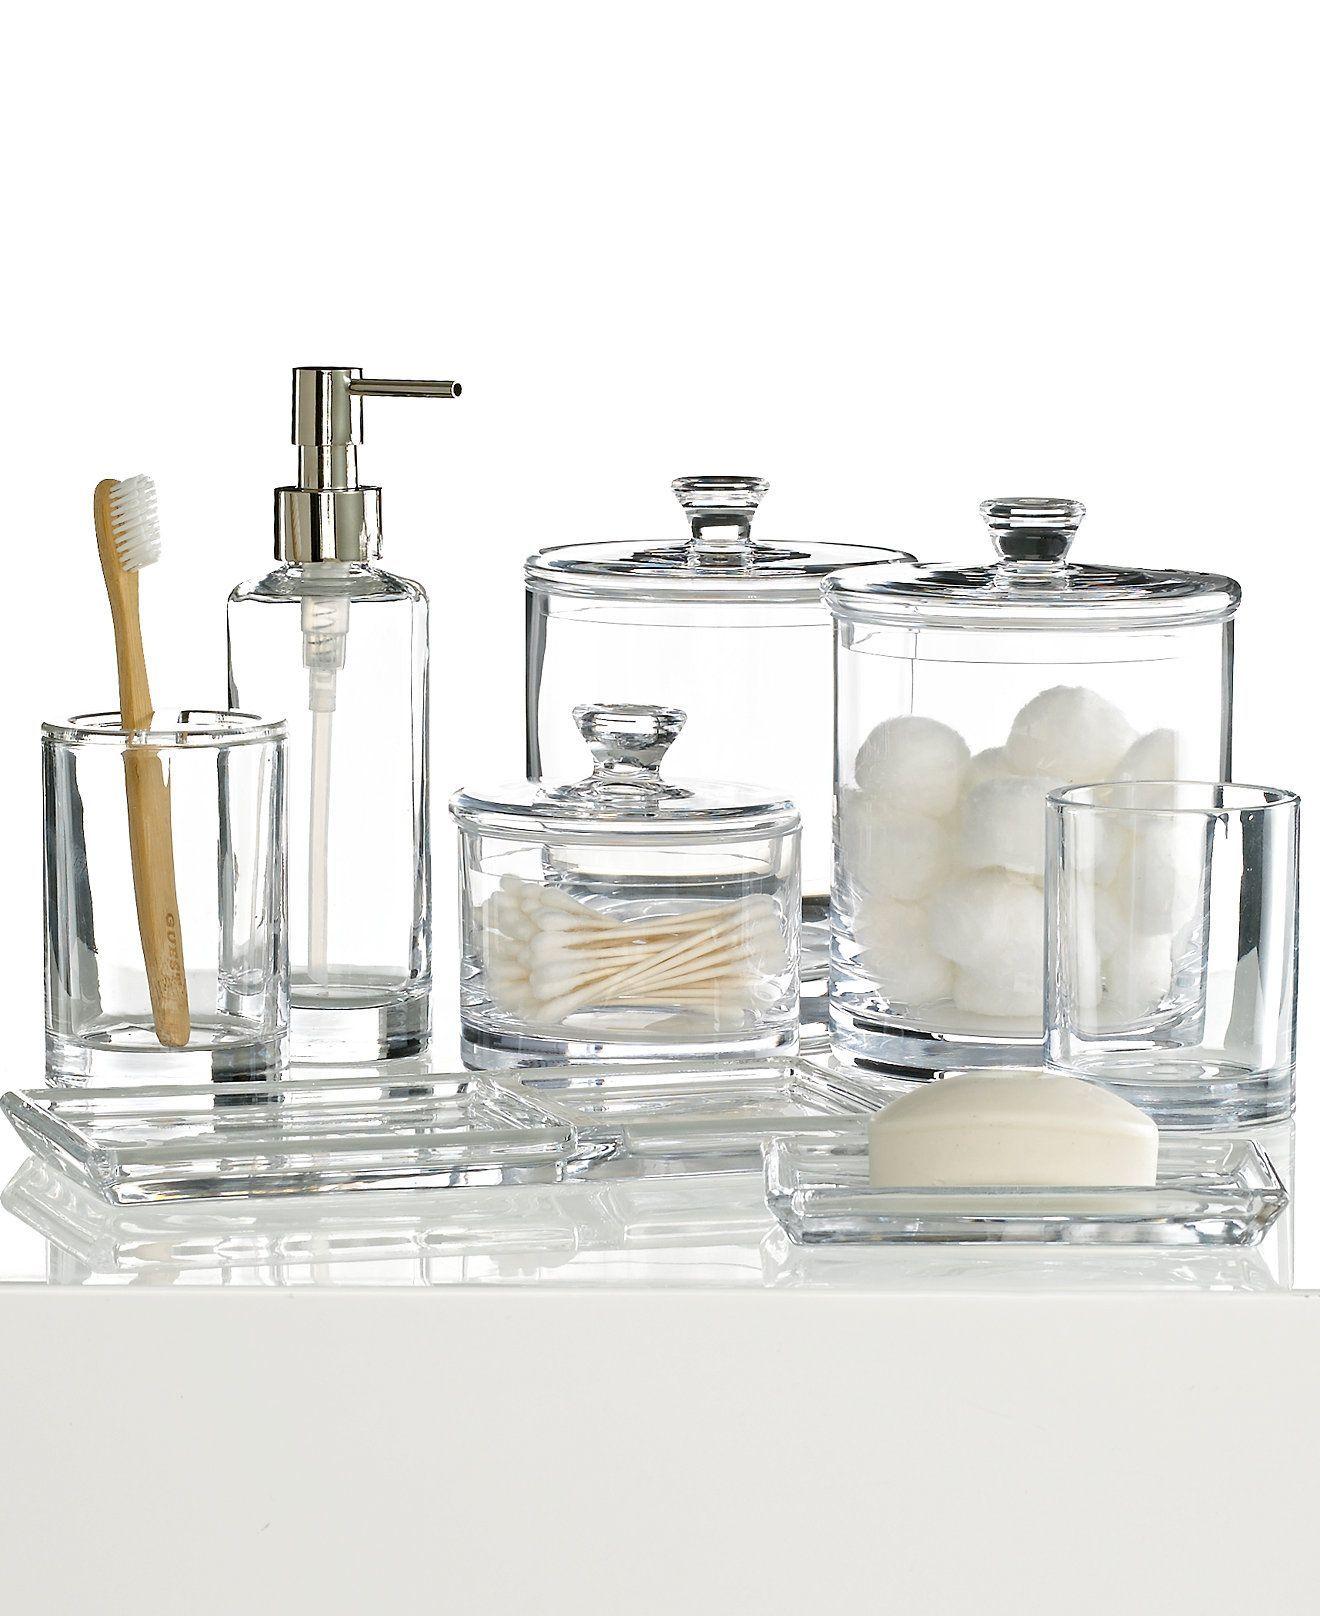 Most Current Snap Shots Contemporary Bathroom Accessories Thoughts Appreciate The Perceptio Glass Bathroom Glass Bathroom Accessories Bathroom Accessories Sets